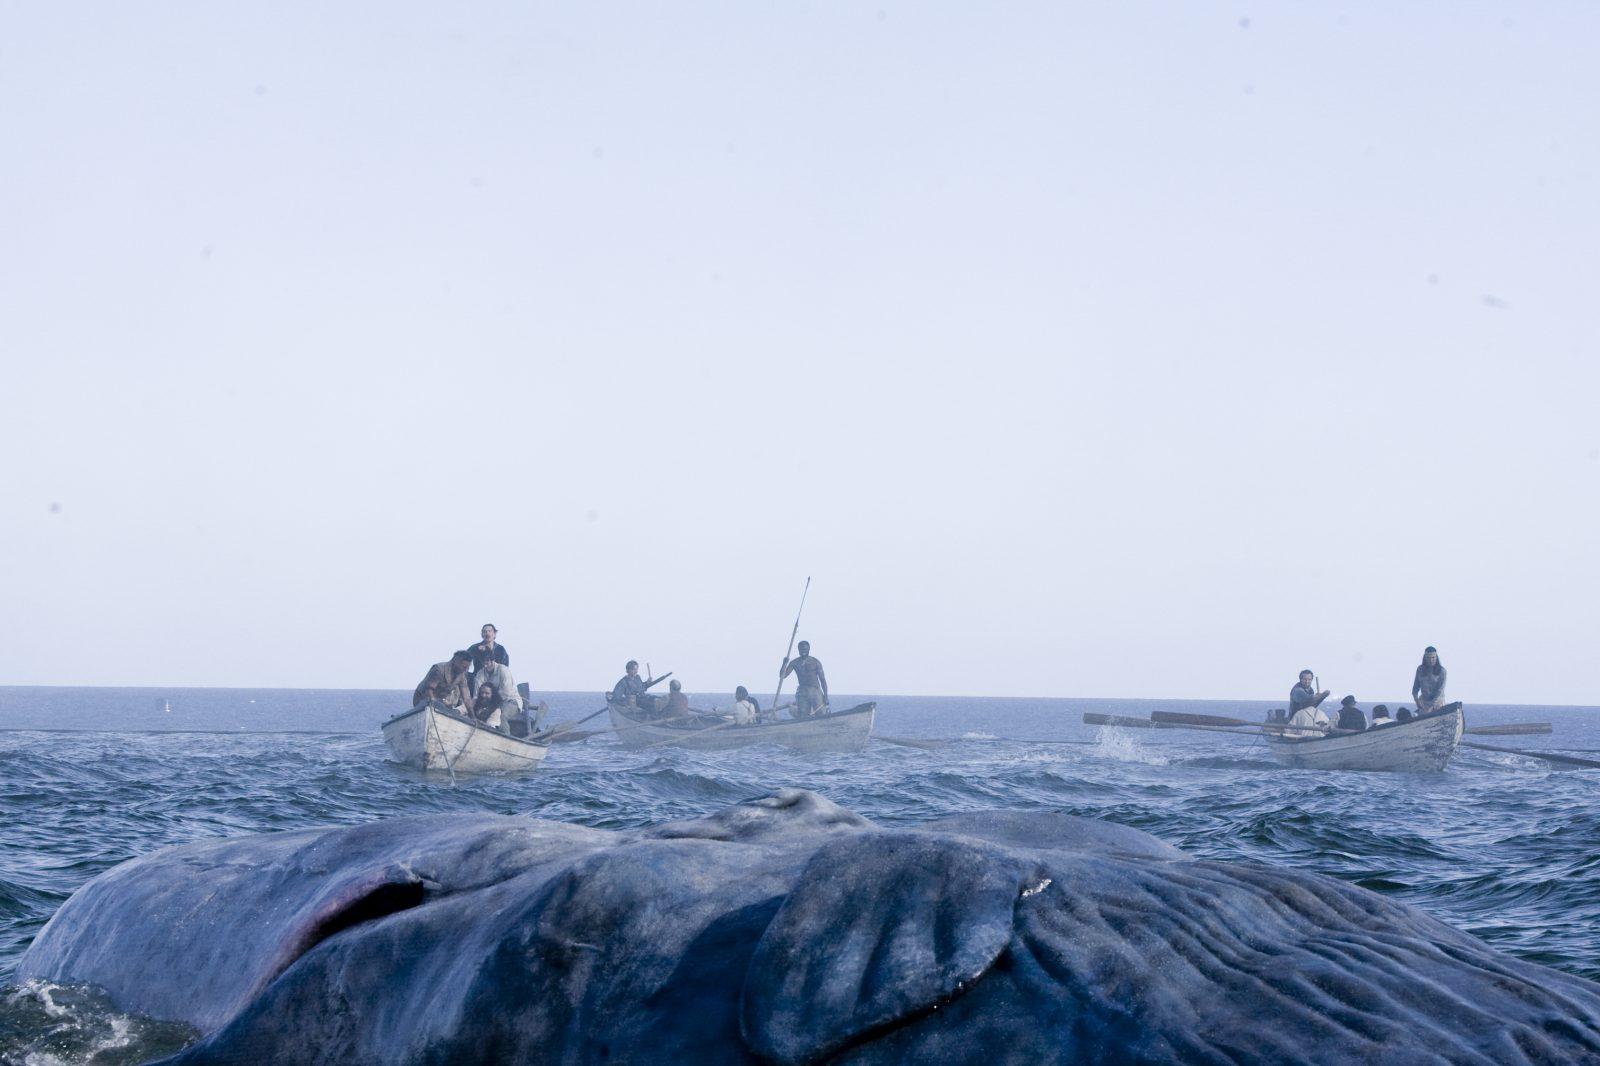 Ocean scene featuring whale